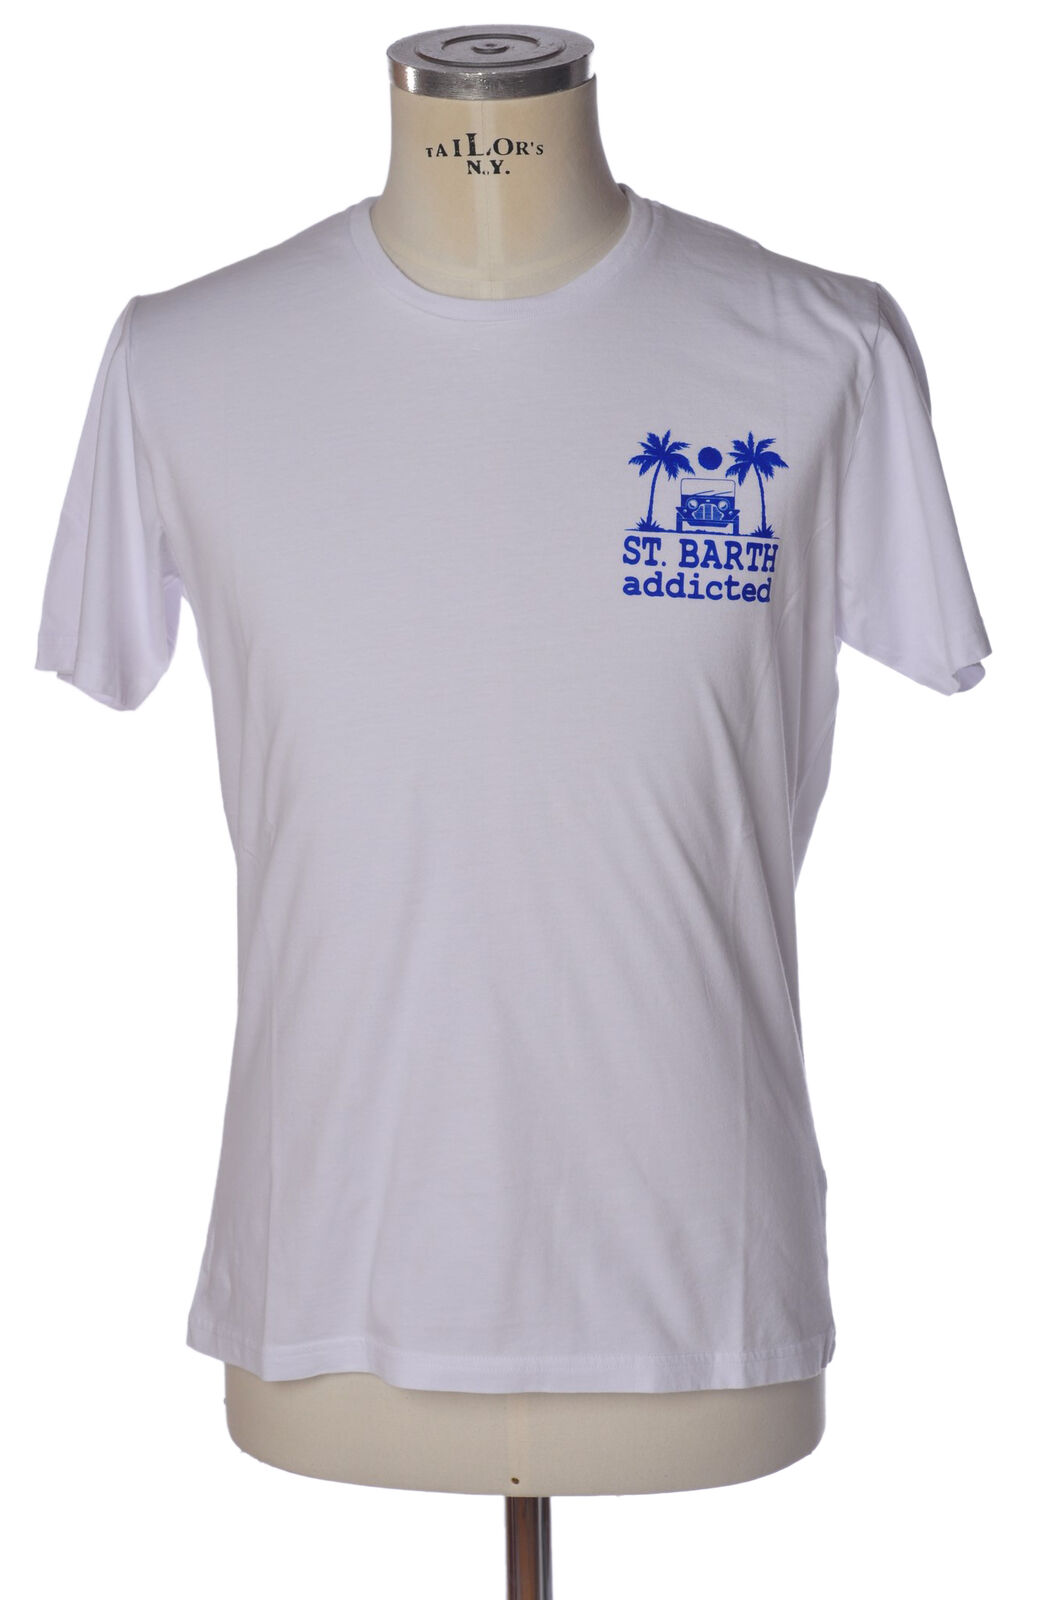 Saint Uomo-Bianco Barth-TOPWEAR-T-Shirt - Uomo-Bianco Saint - 757917C184534 e72c1f